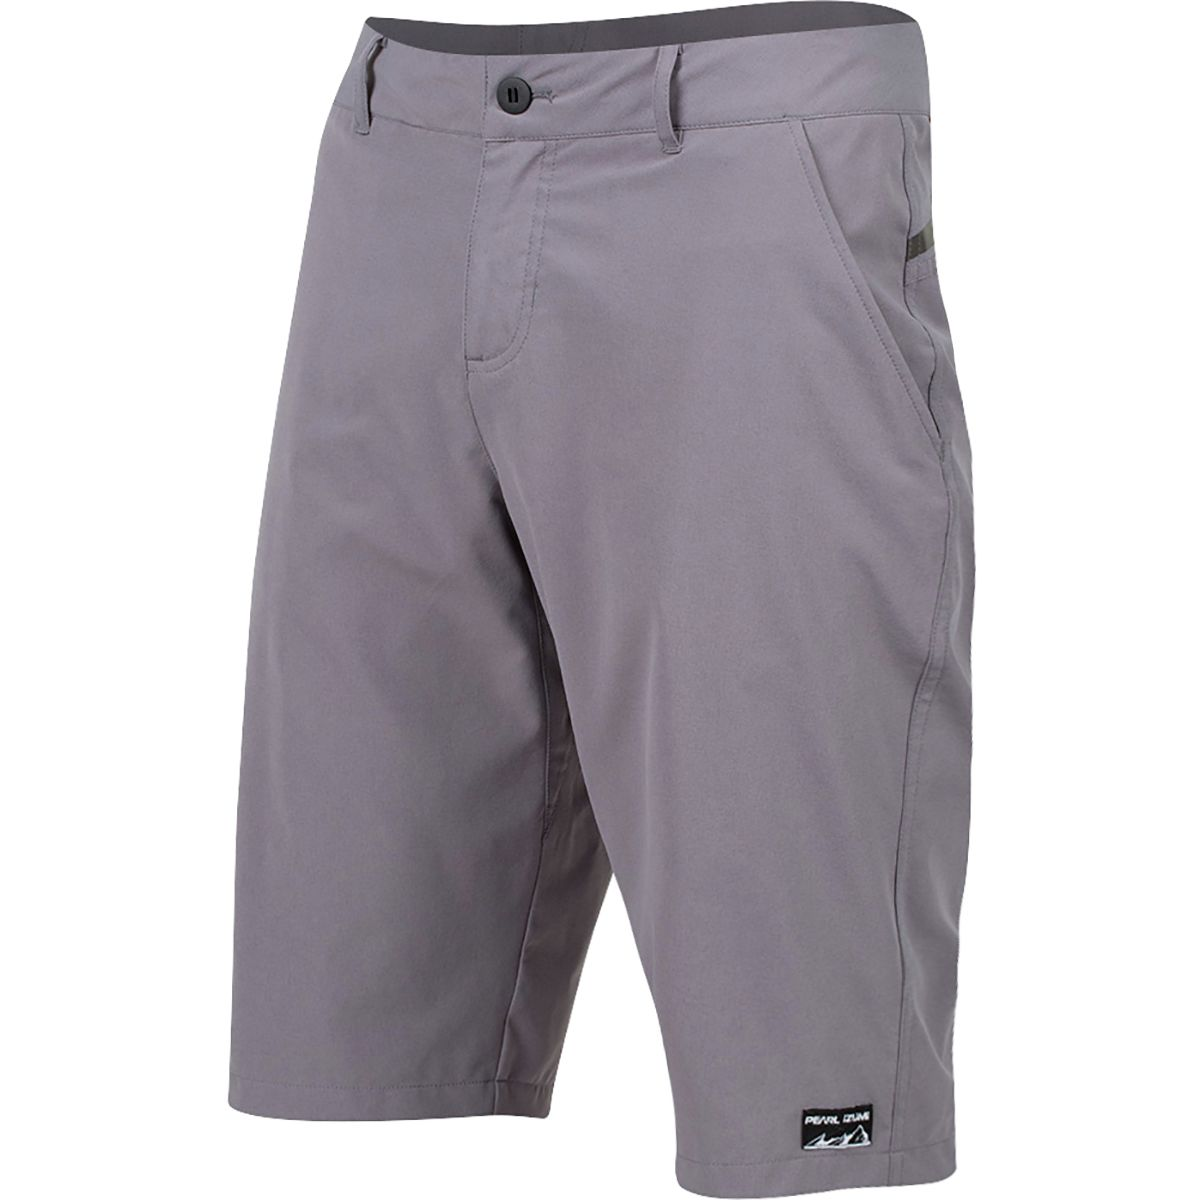 Pearl Izumi Boardwalk Short - Men's